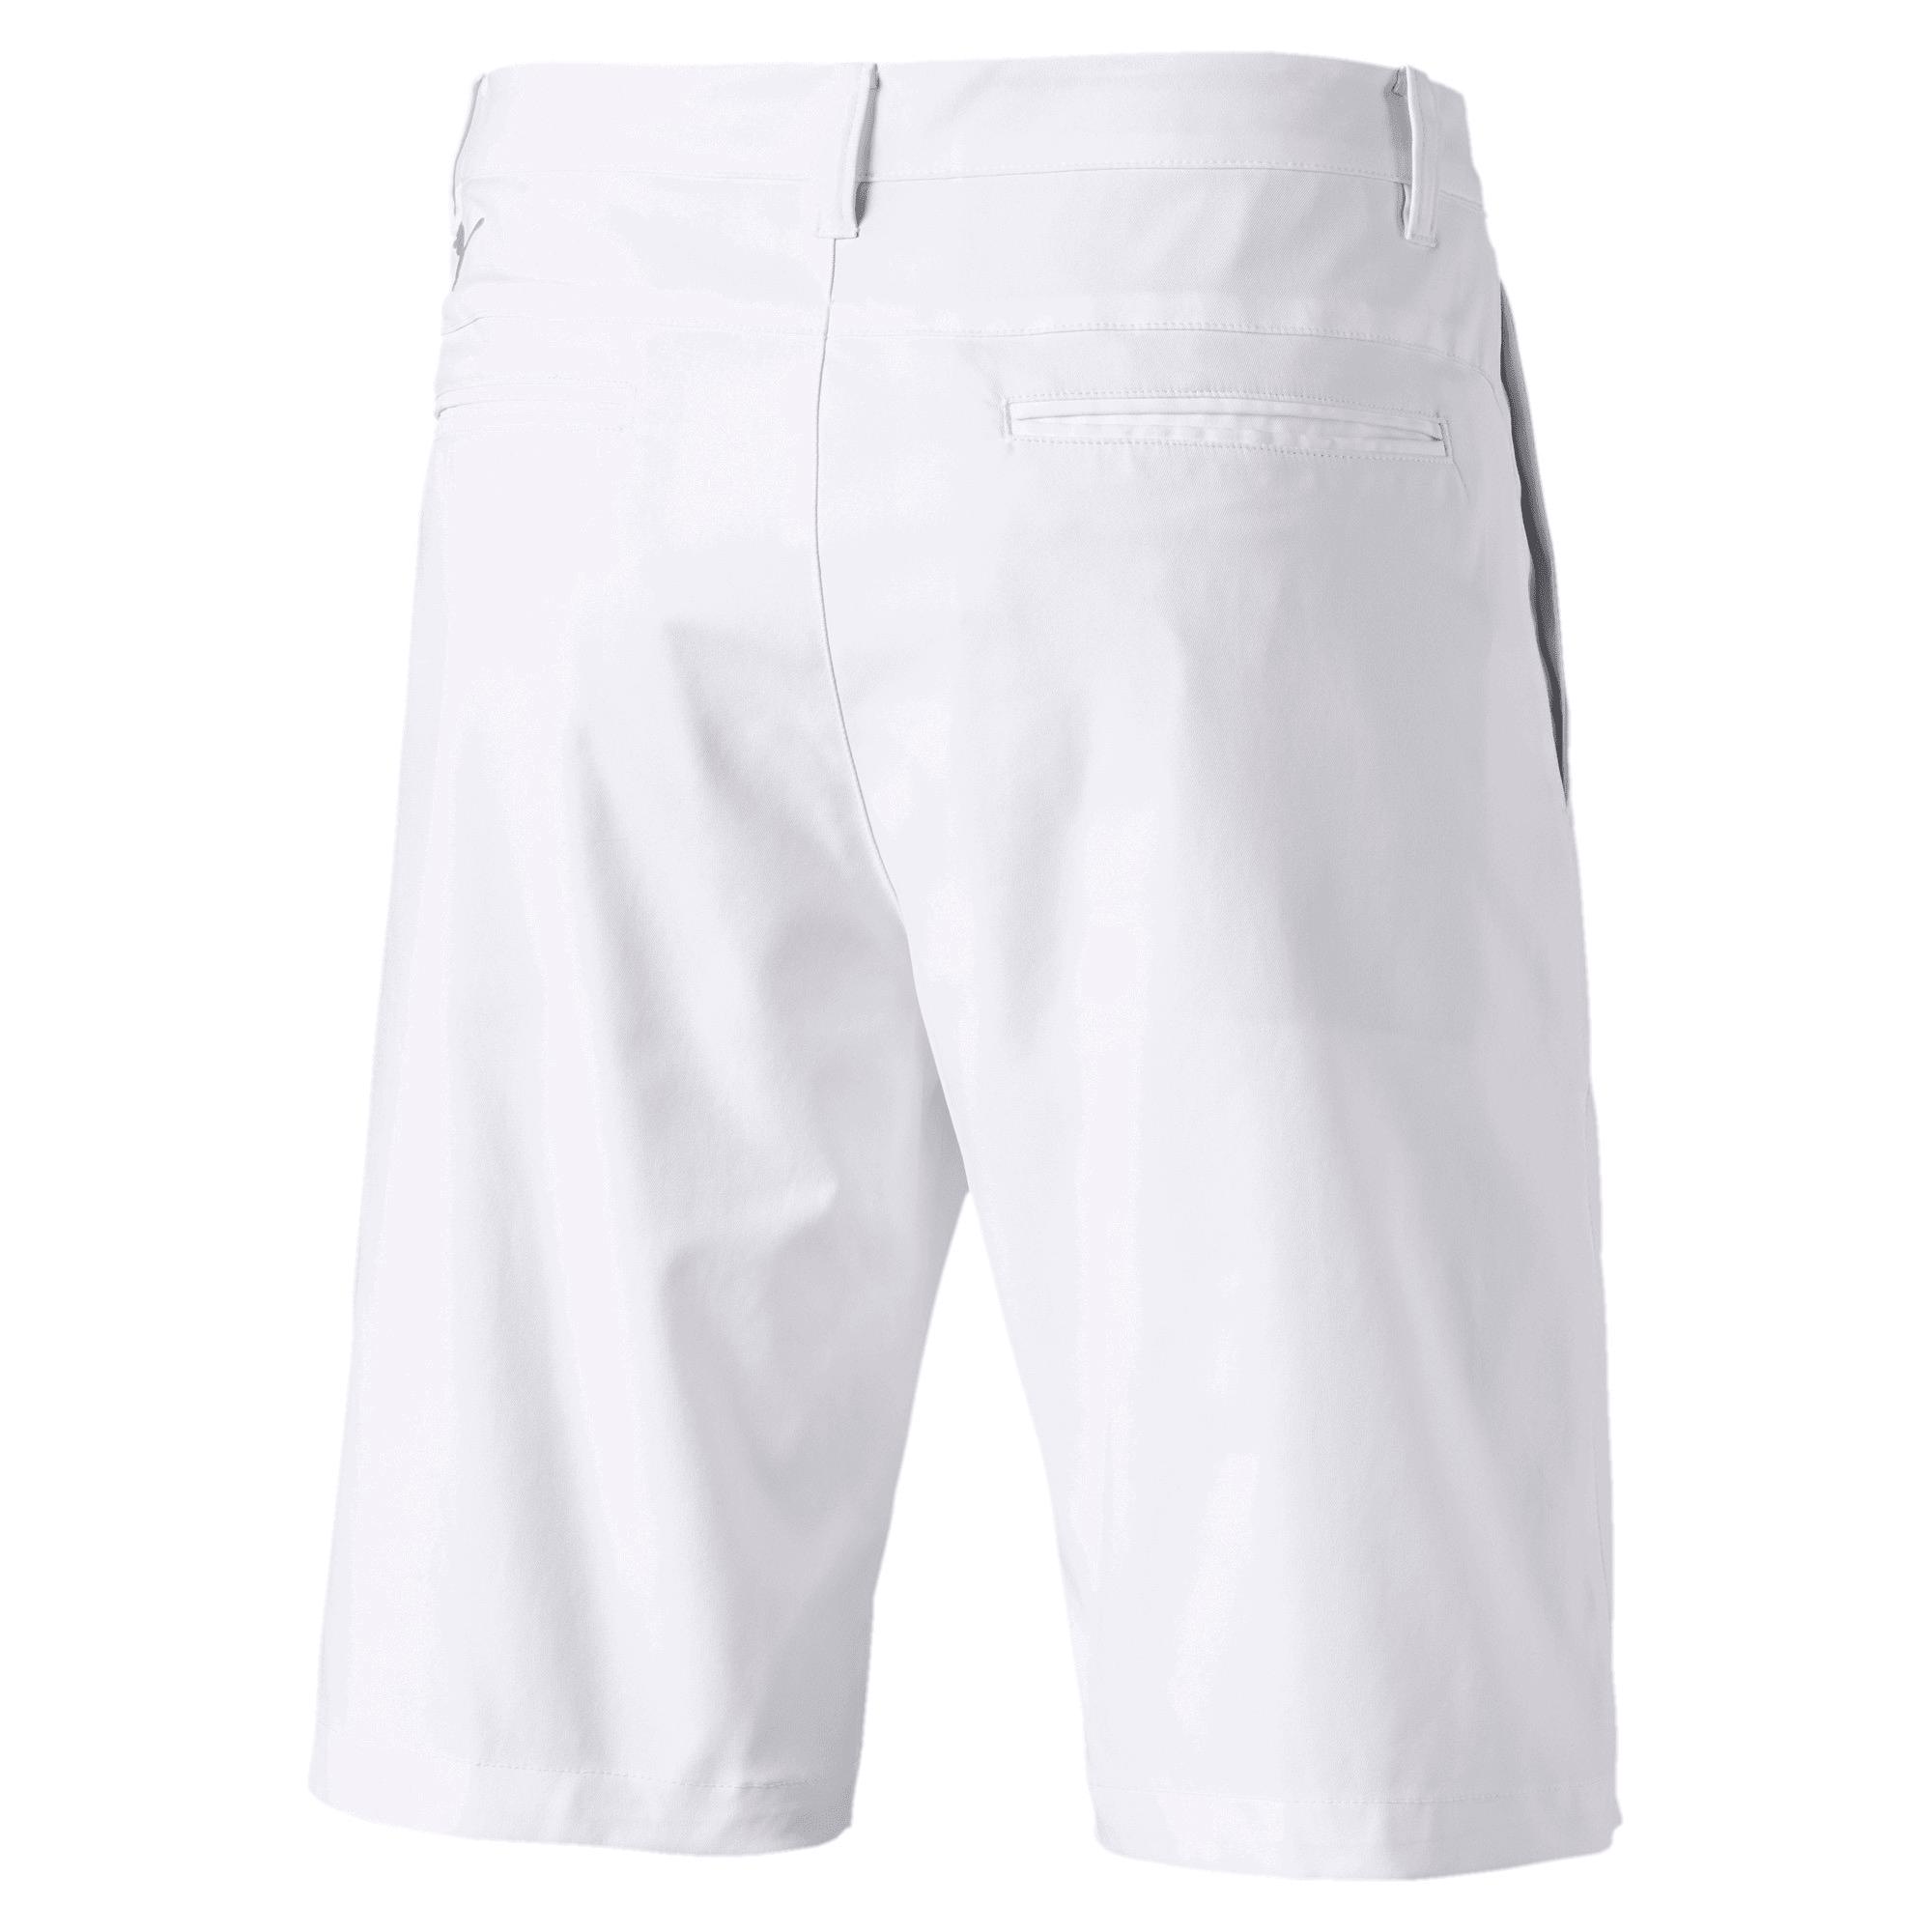 Miniatura 2 de Shorts Jackpot de hombre, Bright White, mediano